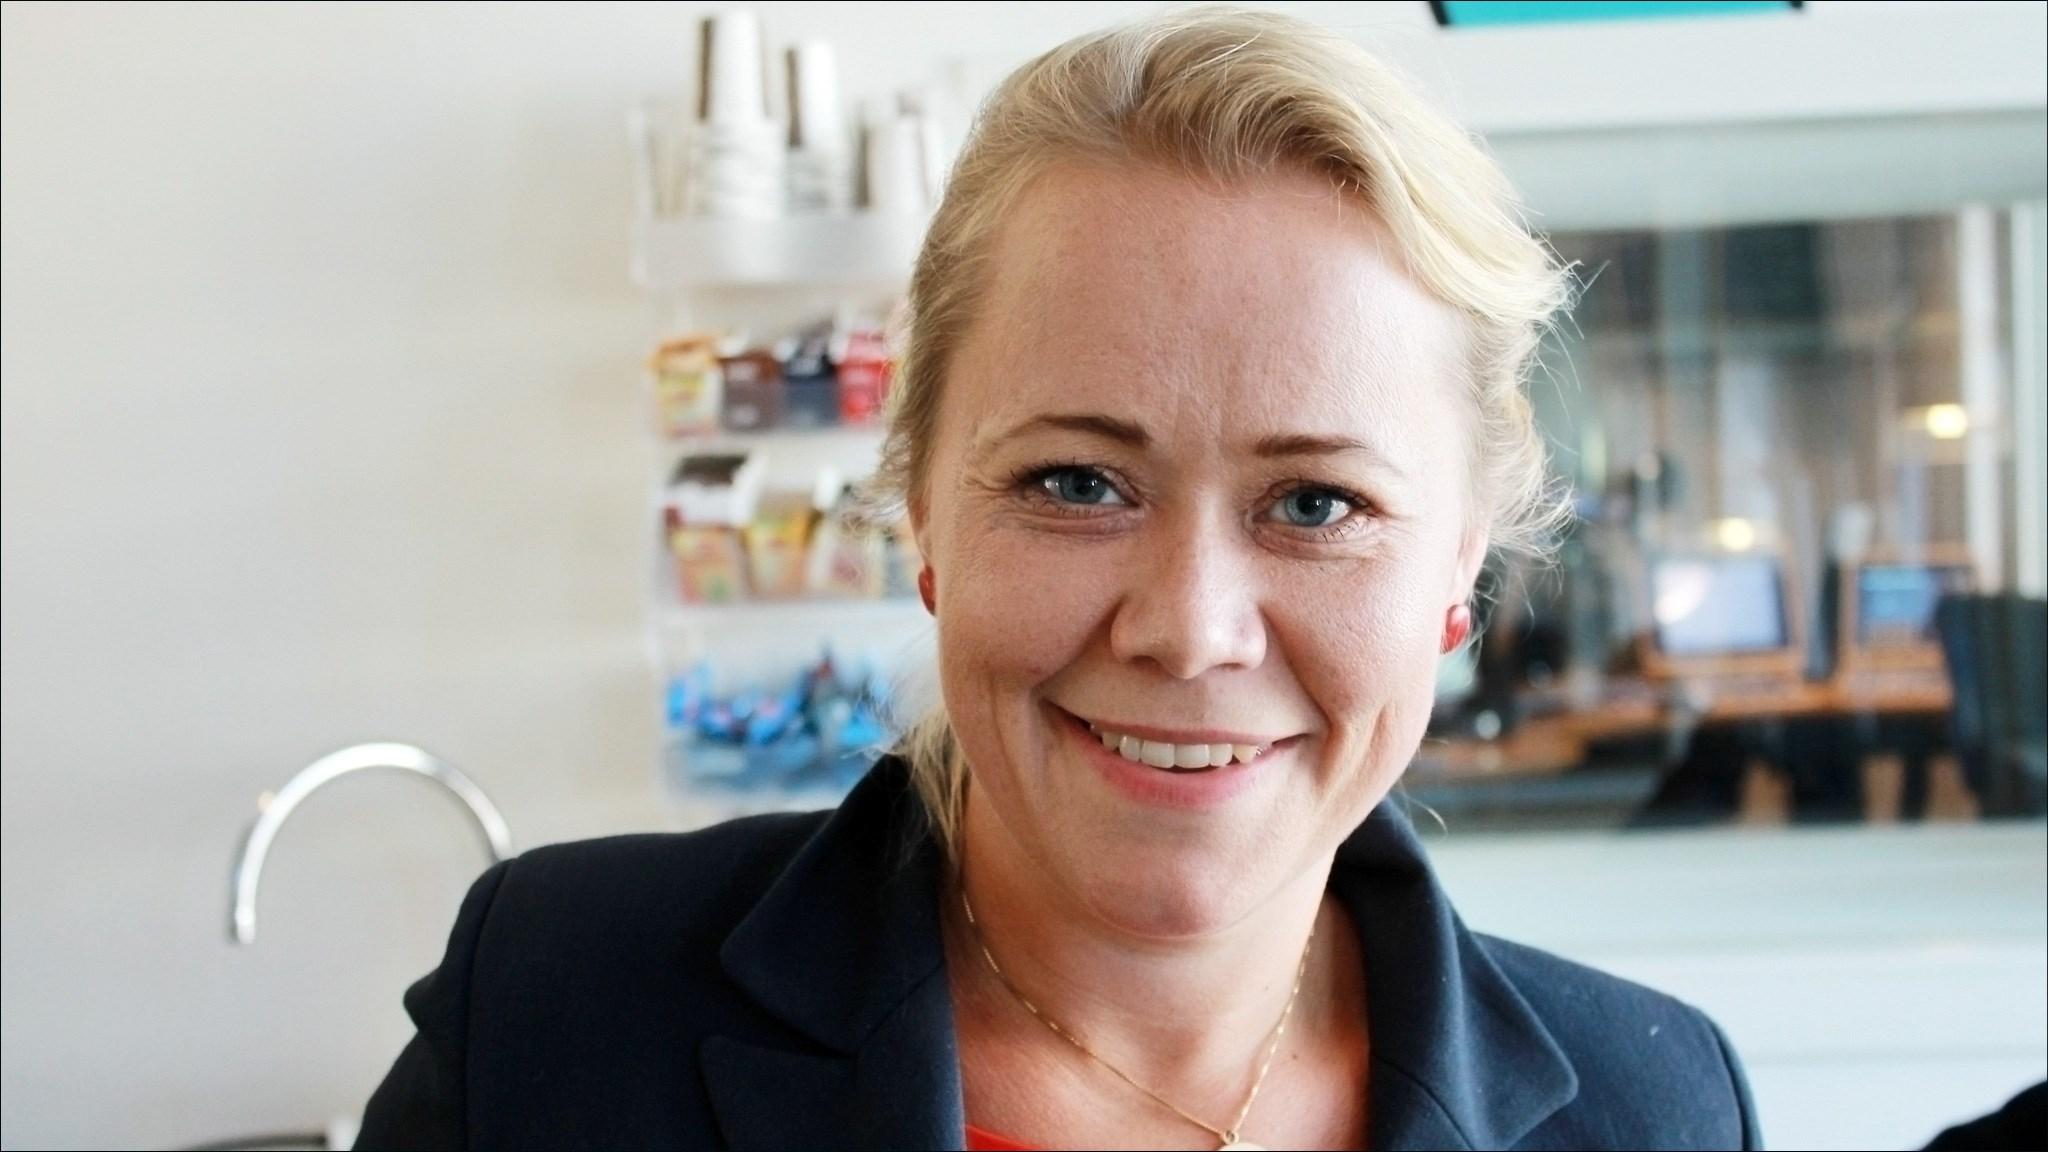 Socialdemokraterna (Swedish Social Democratic party) were represented by Hannah Bergstedt, member of the Riksdag; source: https://sverigesradio.se/sida/artikel.aspx?programid=98&artikel=6813189